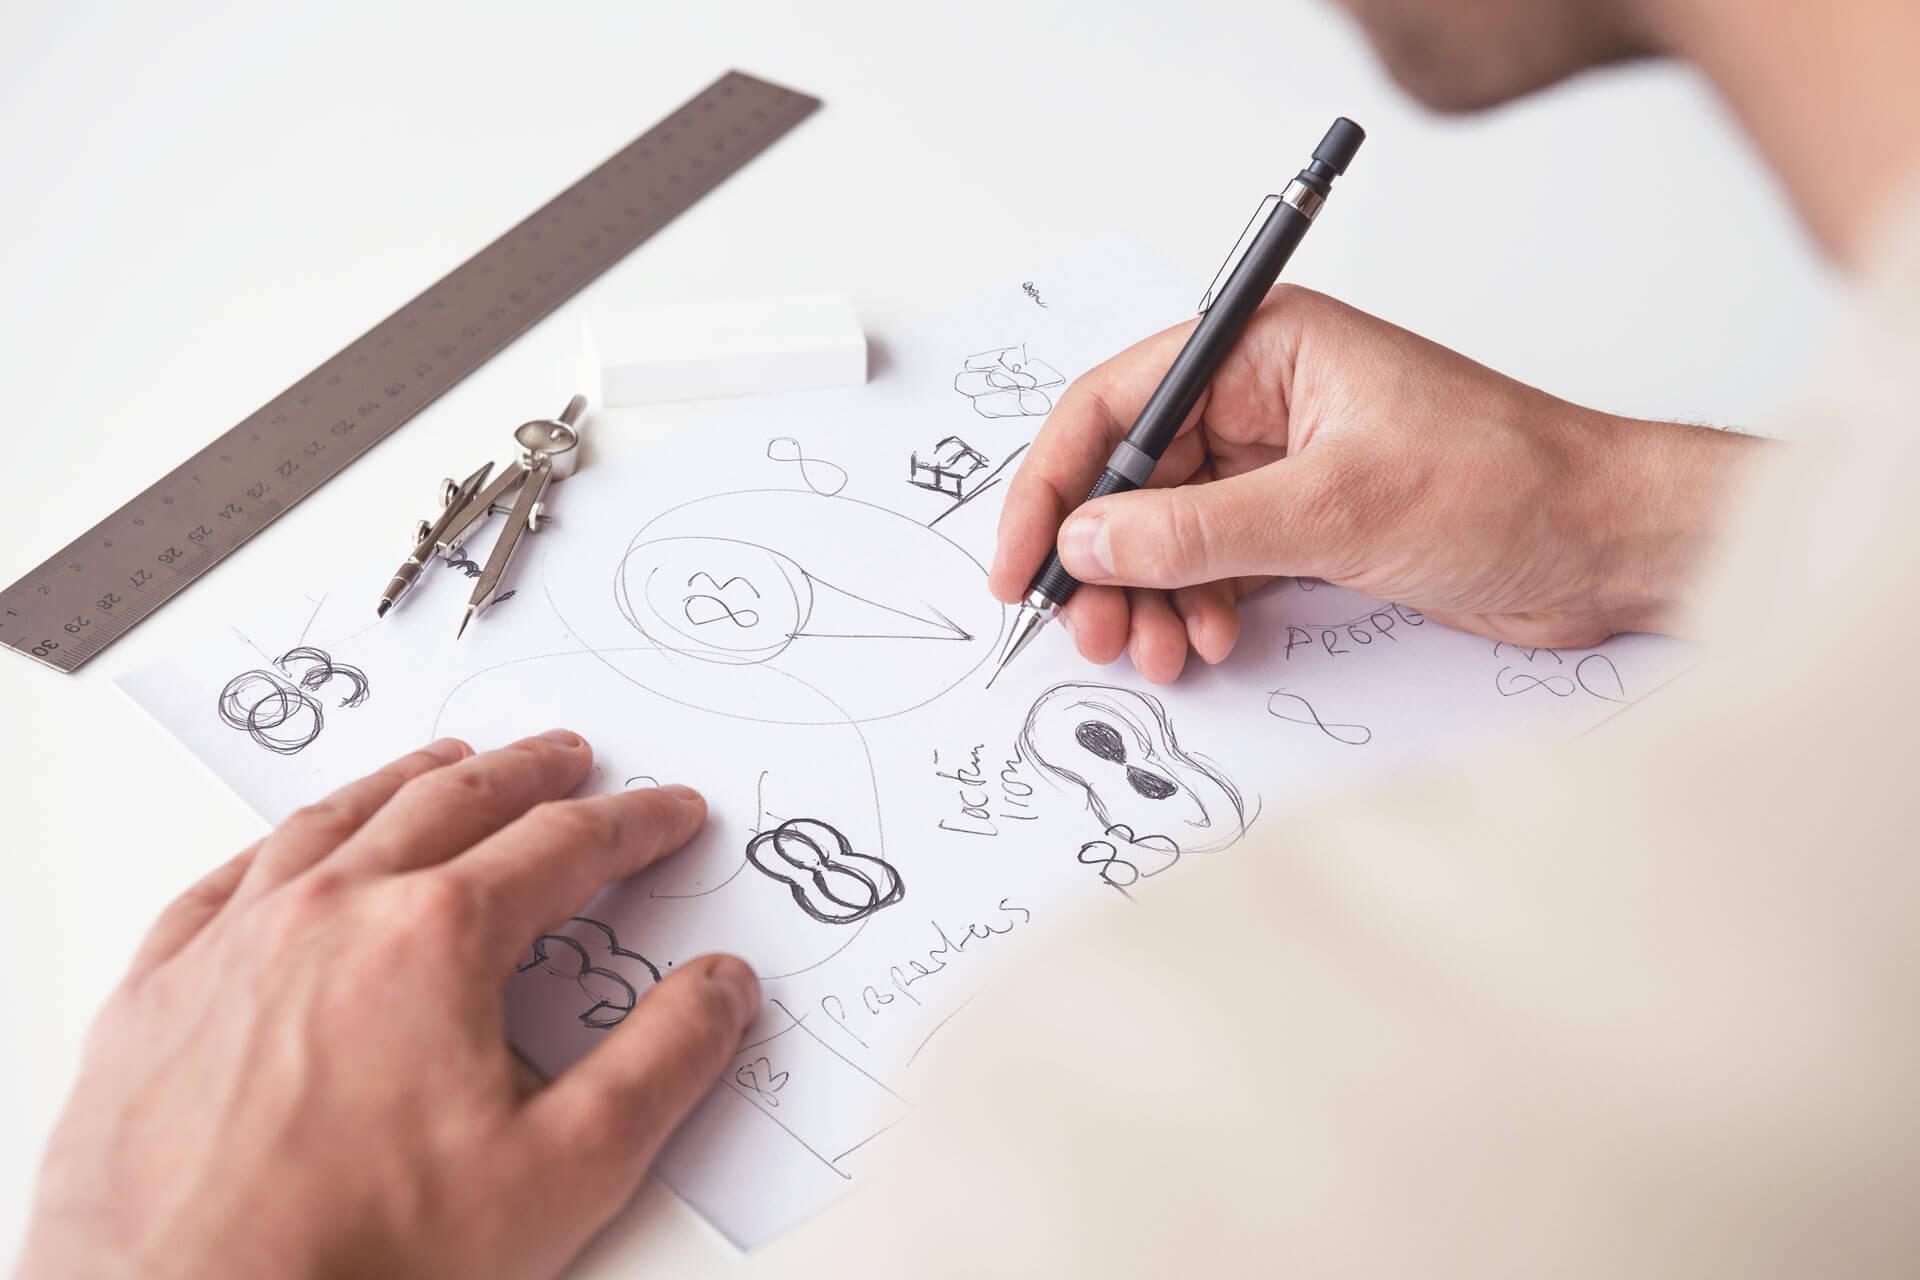 83 Properties Logo Design Sketches